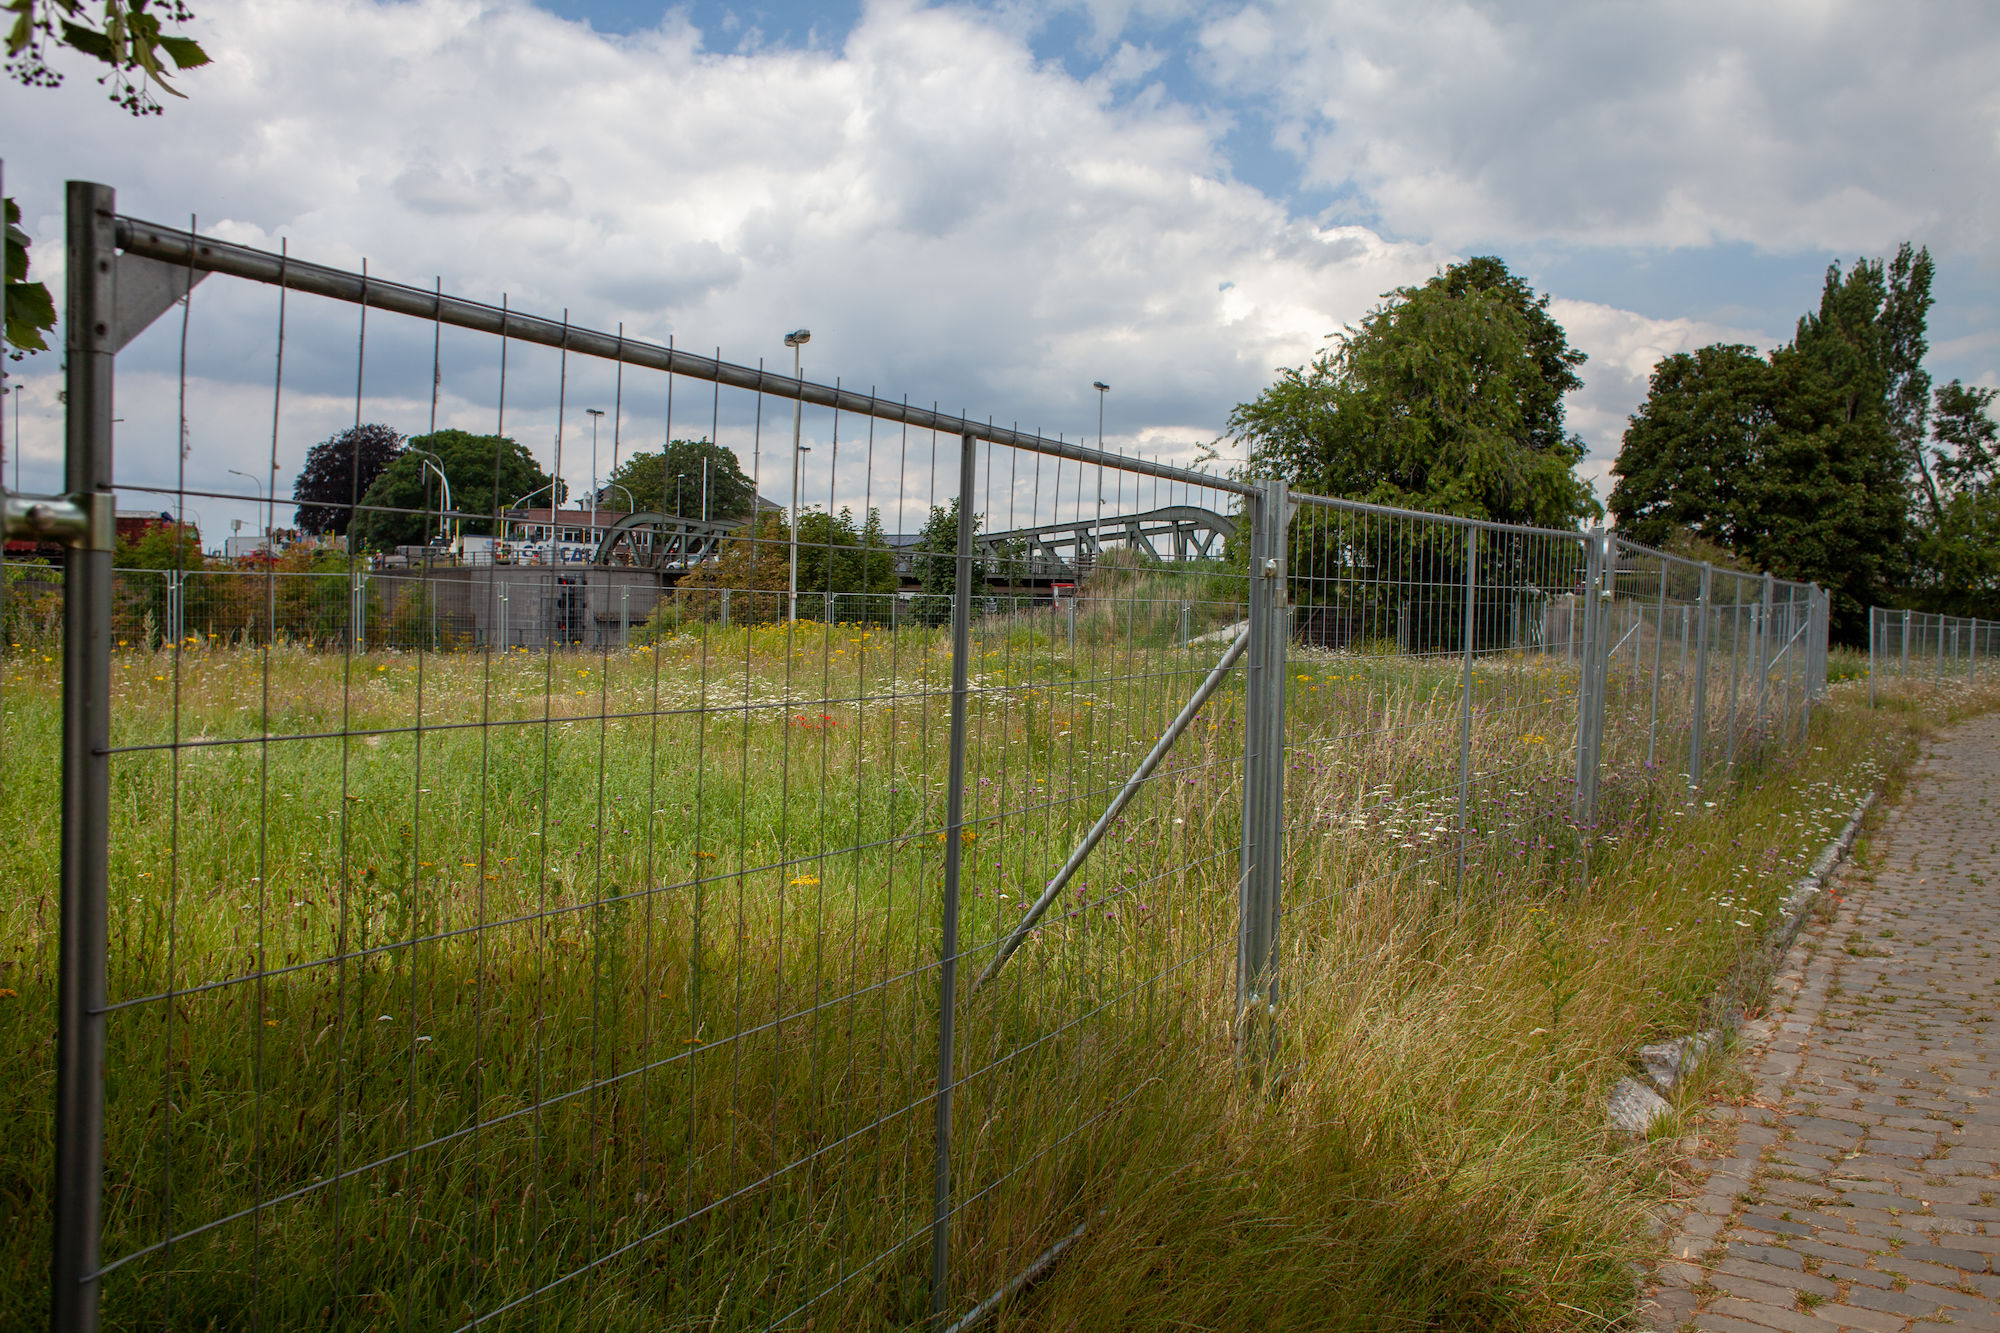 2019-07-02 Muide Meulestede prospectie Wannes_stadsvernieuwing_IMG_0365-2.jpg